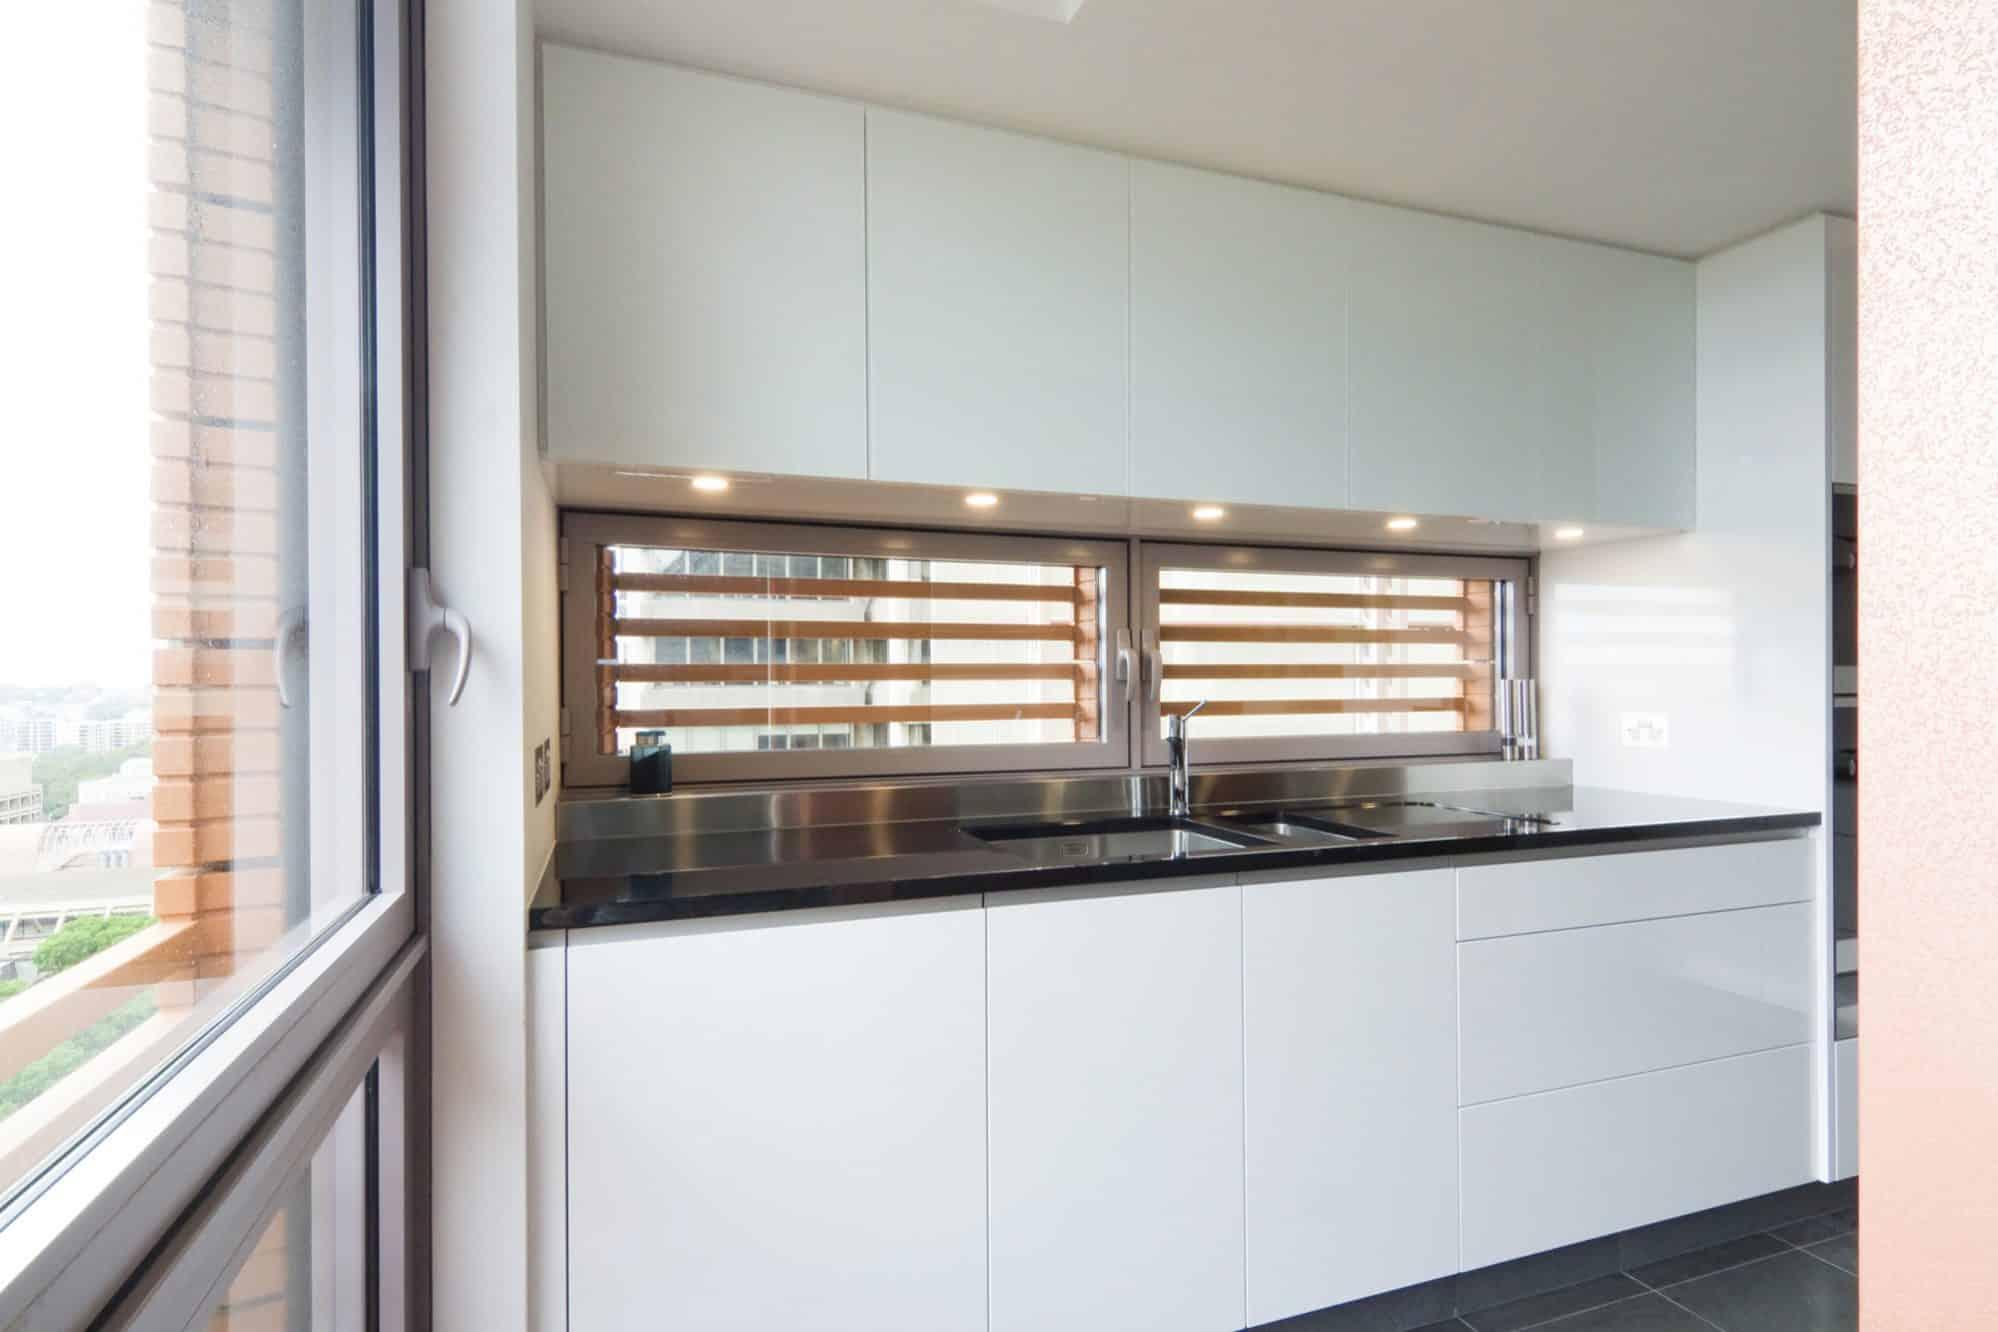 Bespoke apartment kitchen